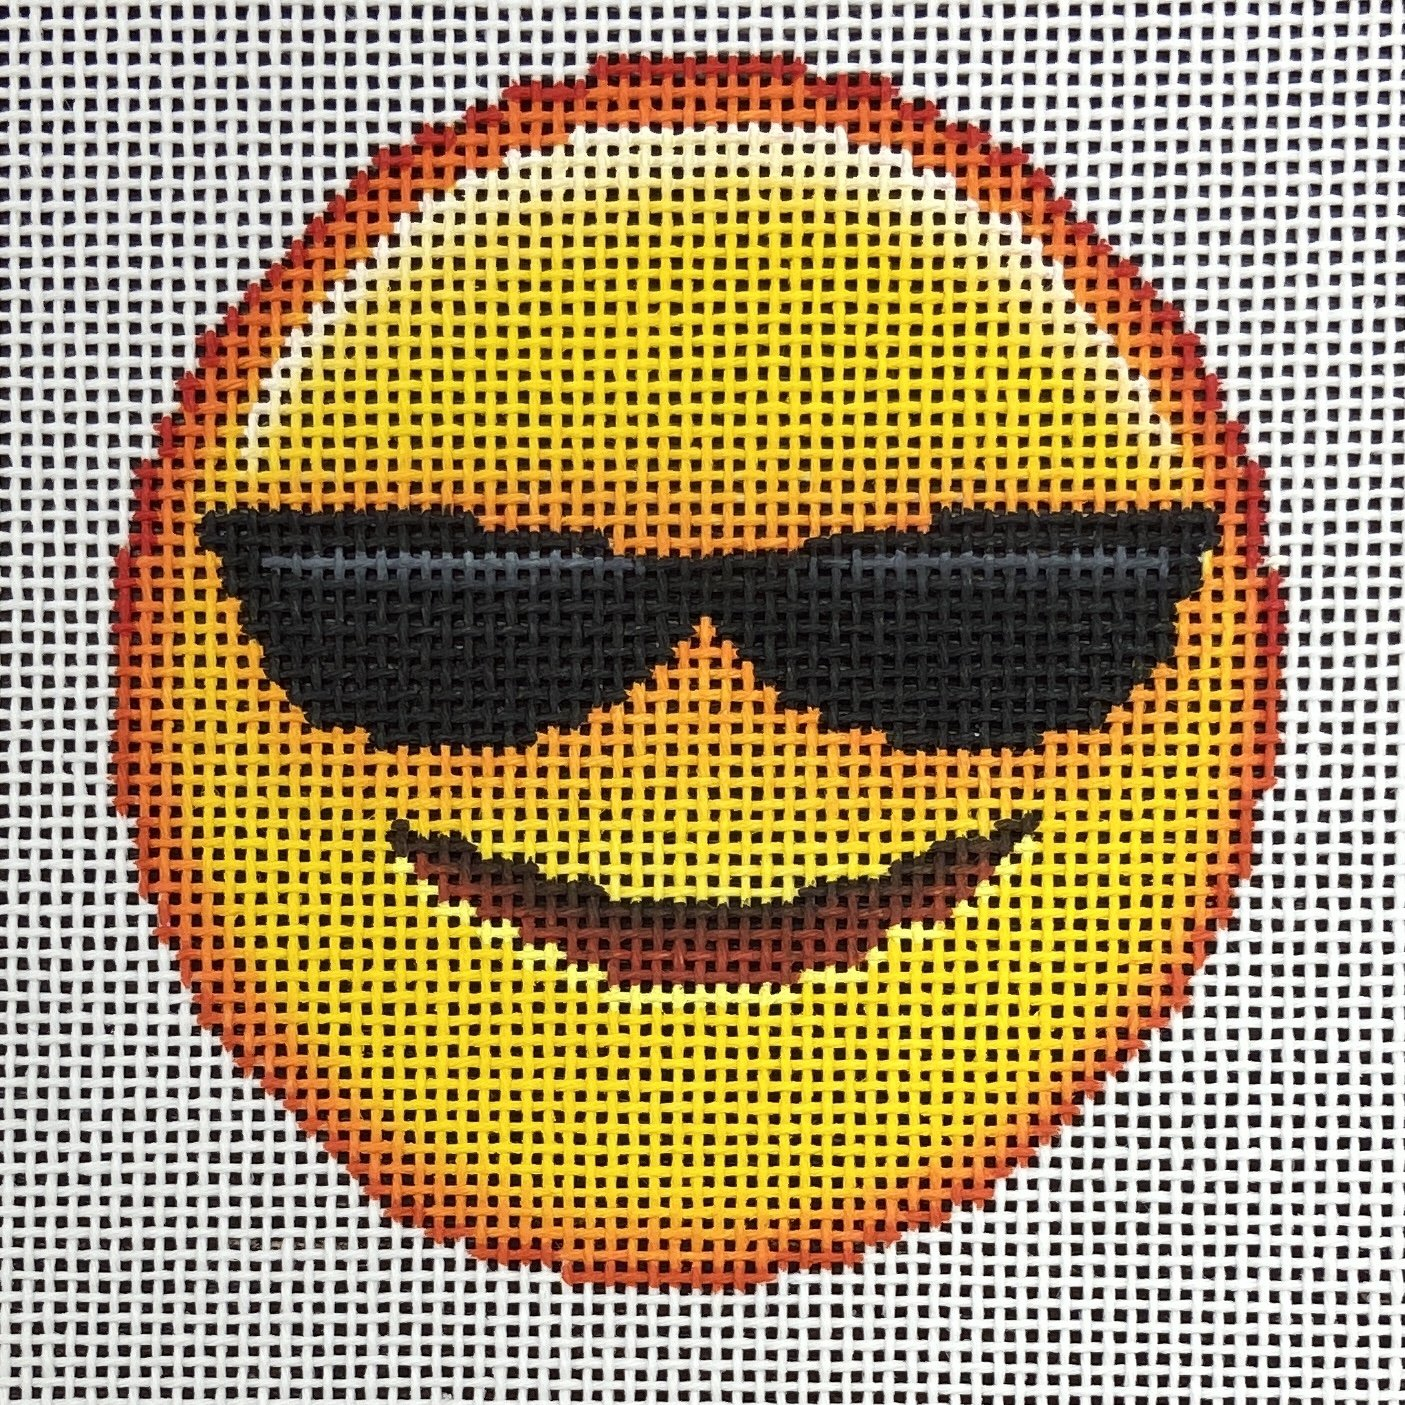 EJ002 Cool Emoji Ornament Point Of It All Designs